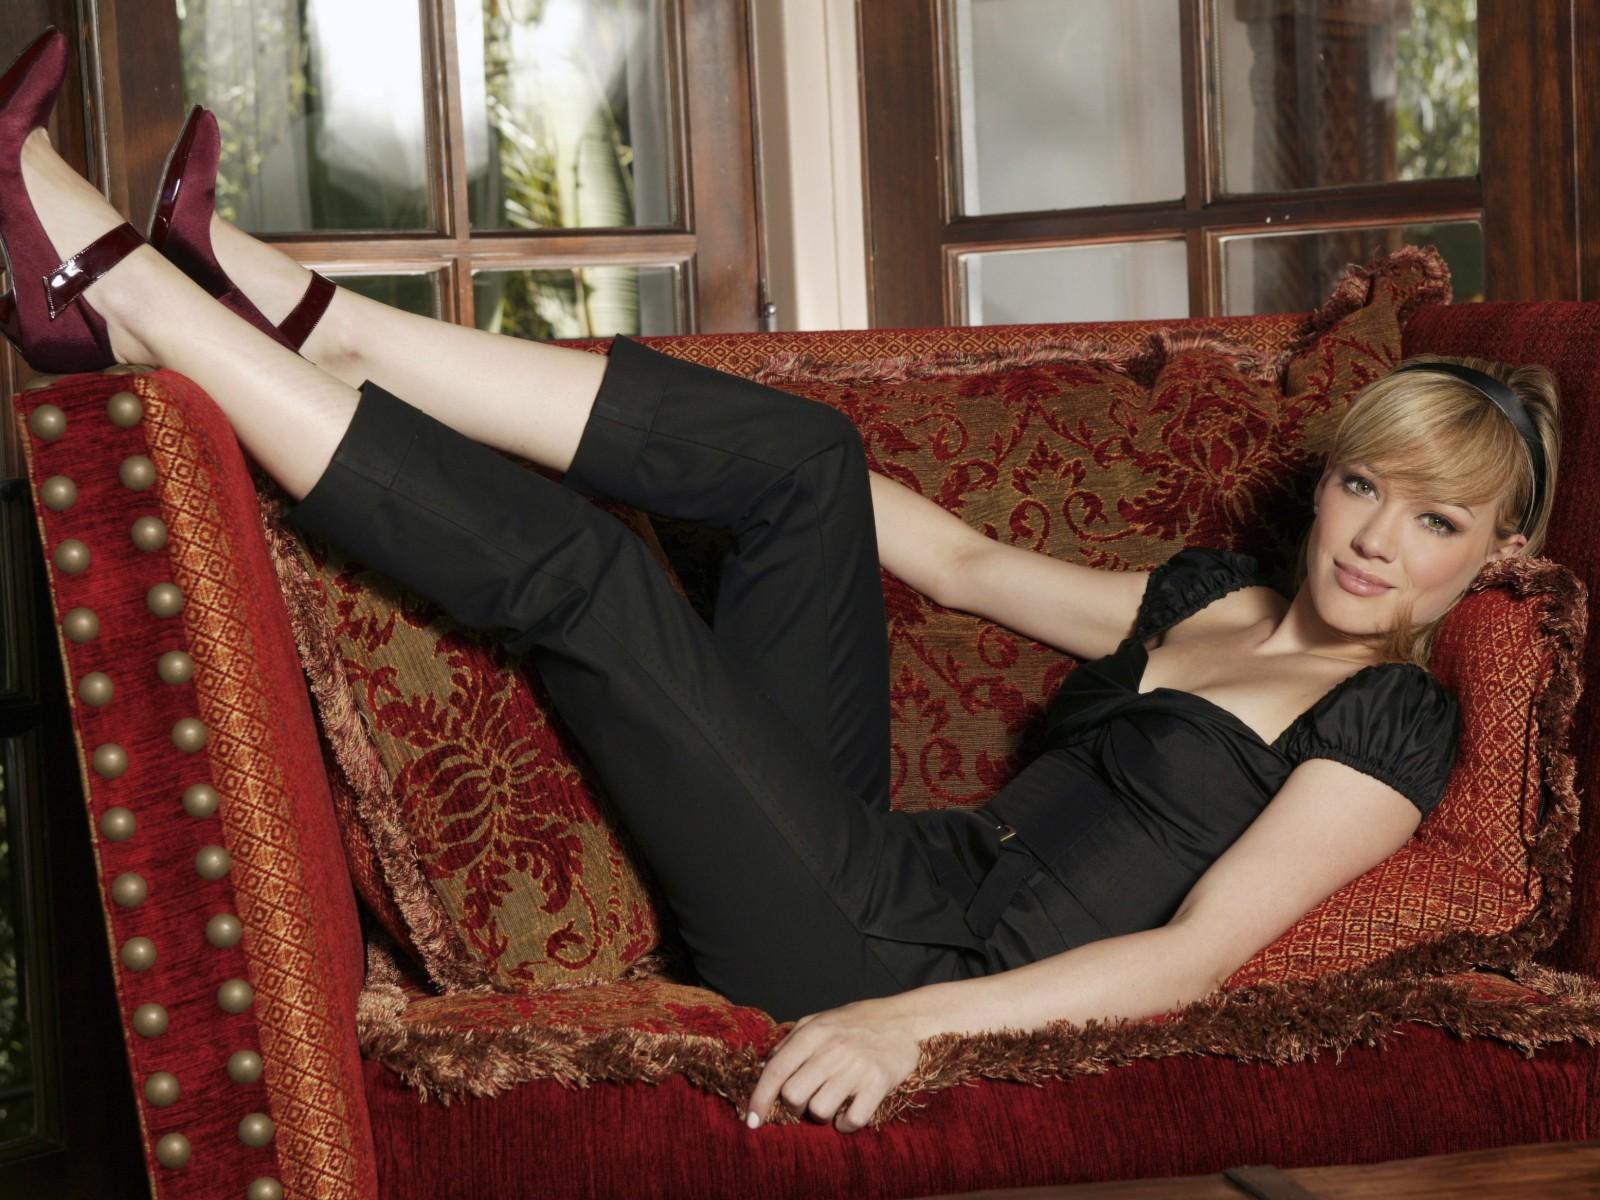 Hilary Duff, Hot Photoshoot